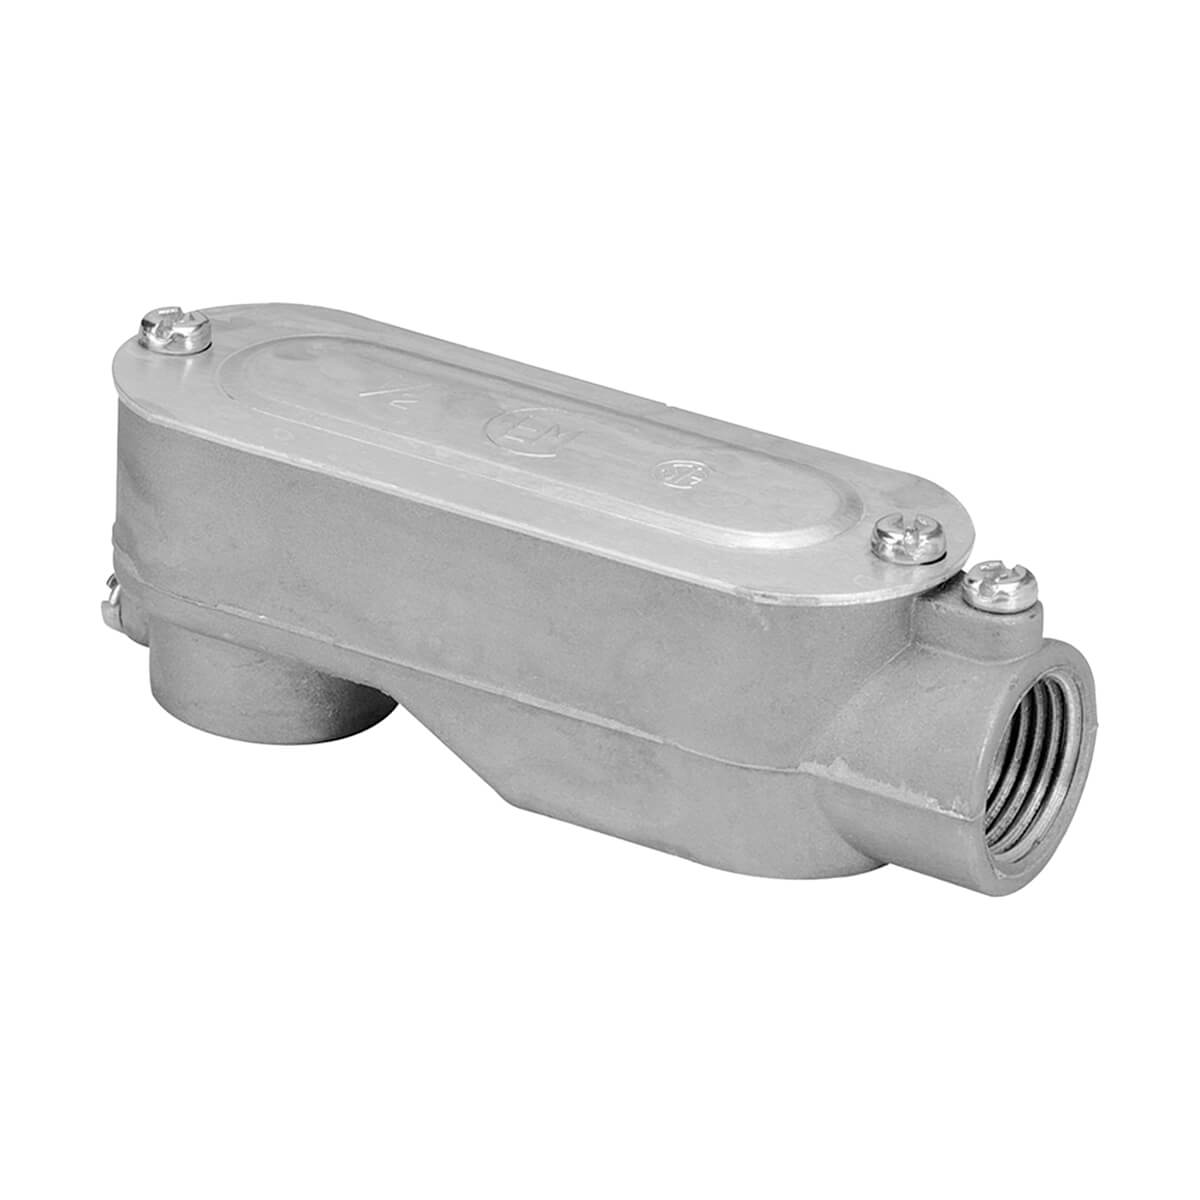 Conduit Body EMT/Rigid - Type LB - 1-1/4-in